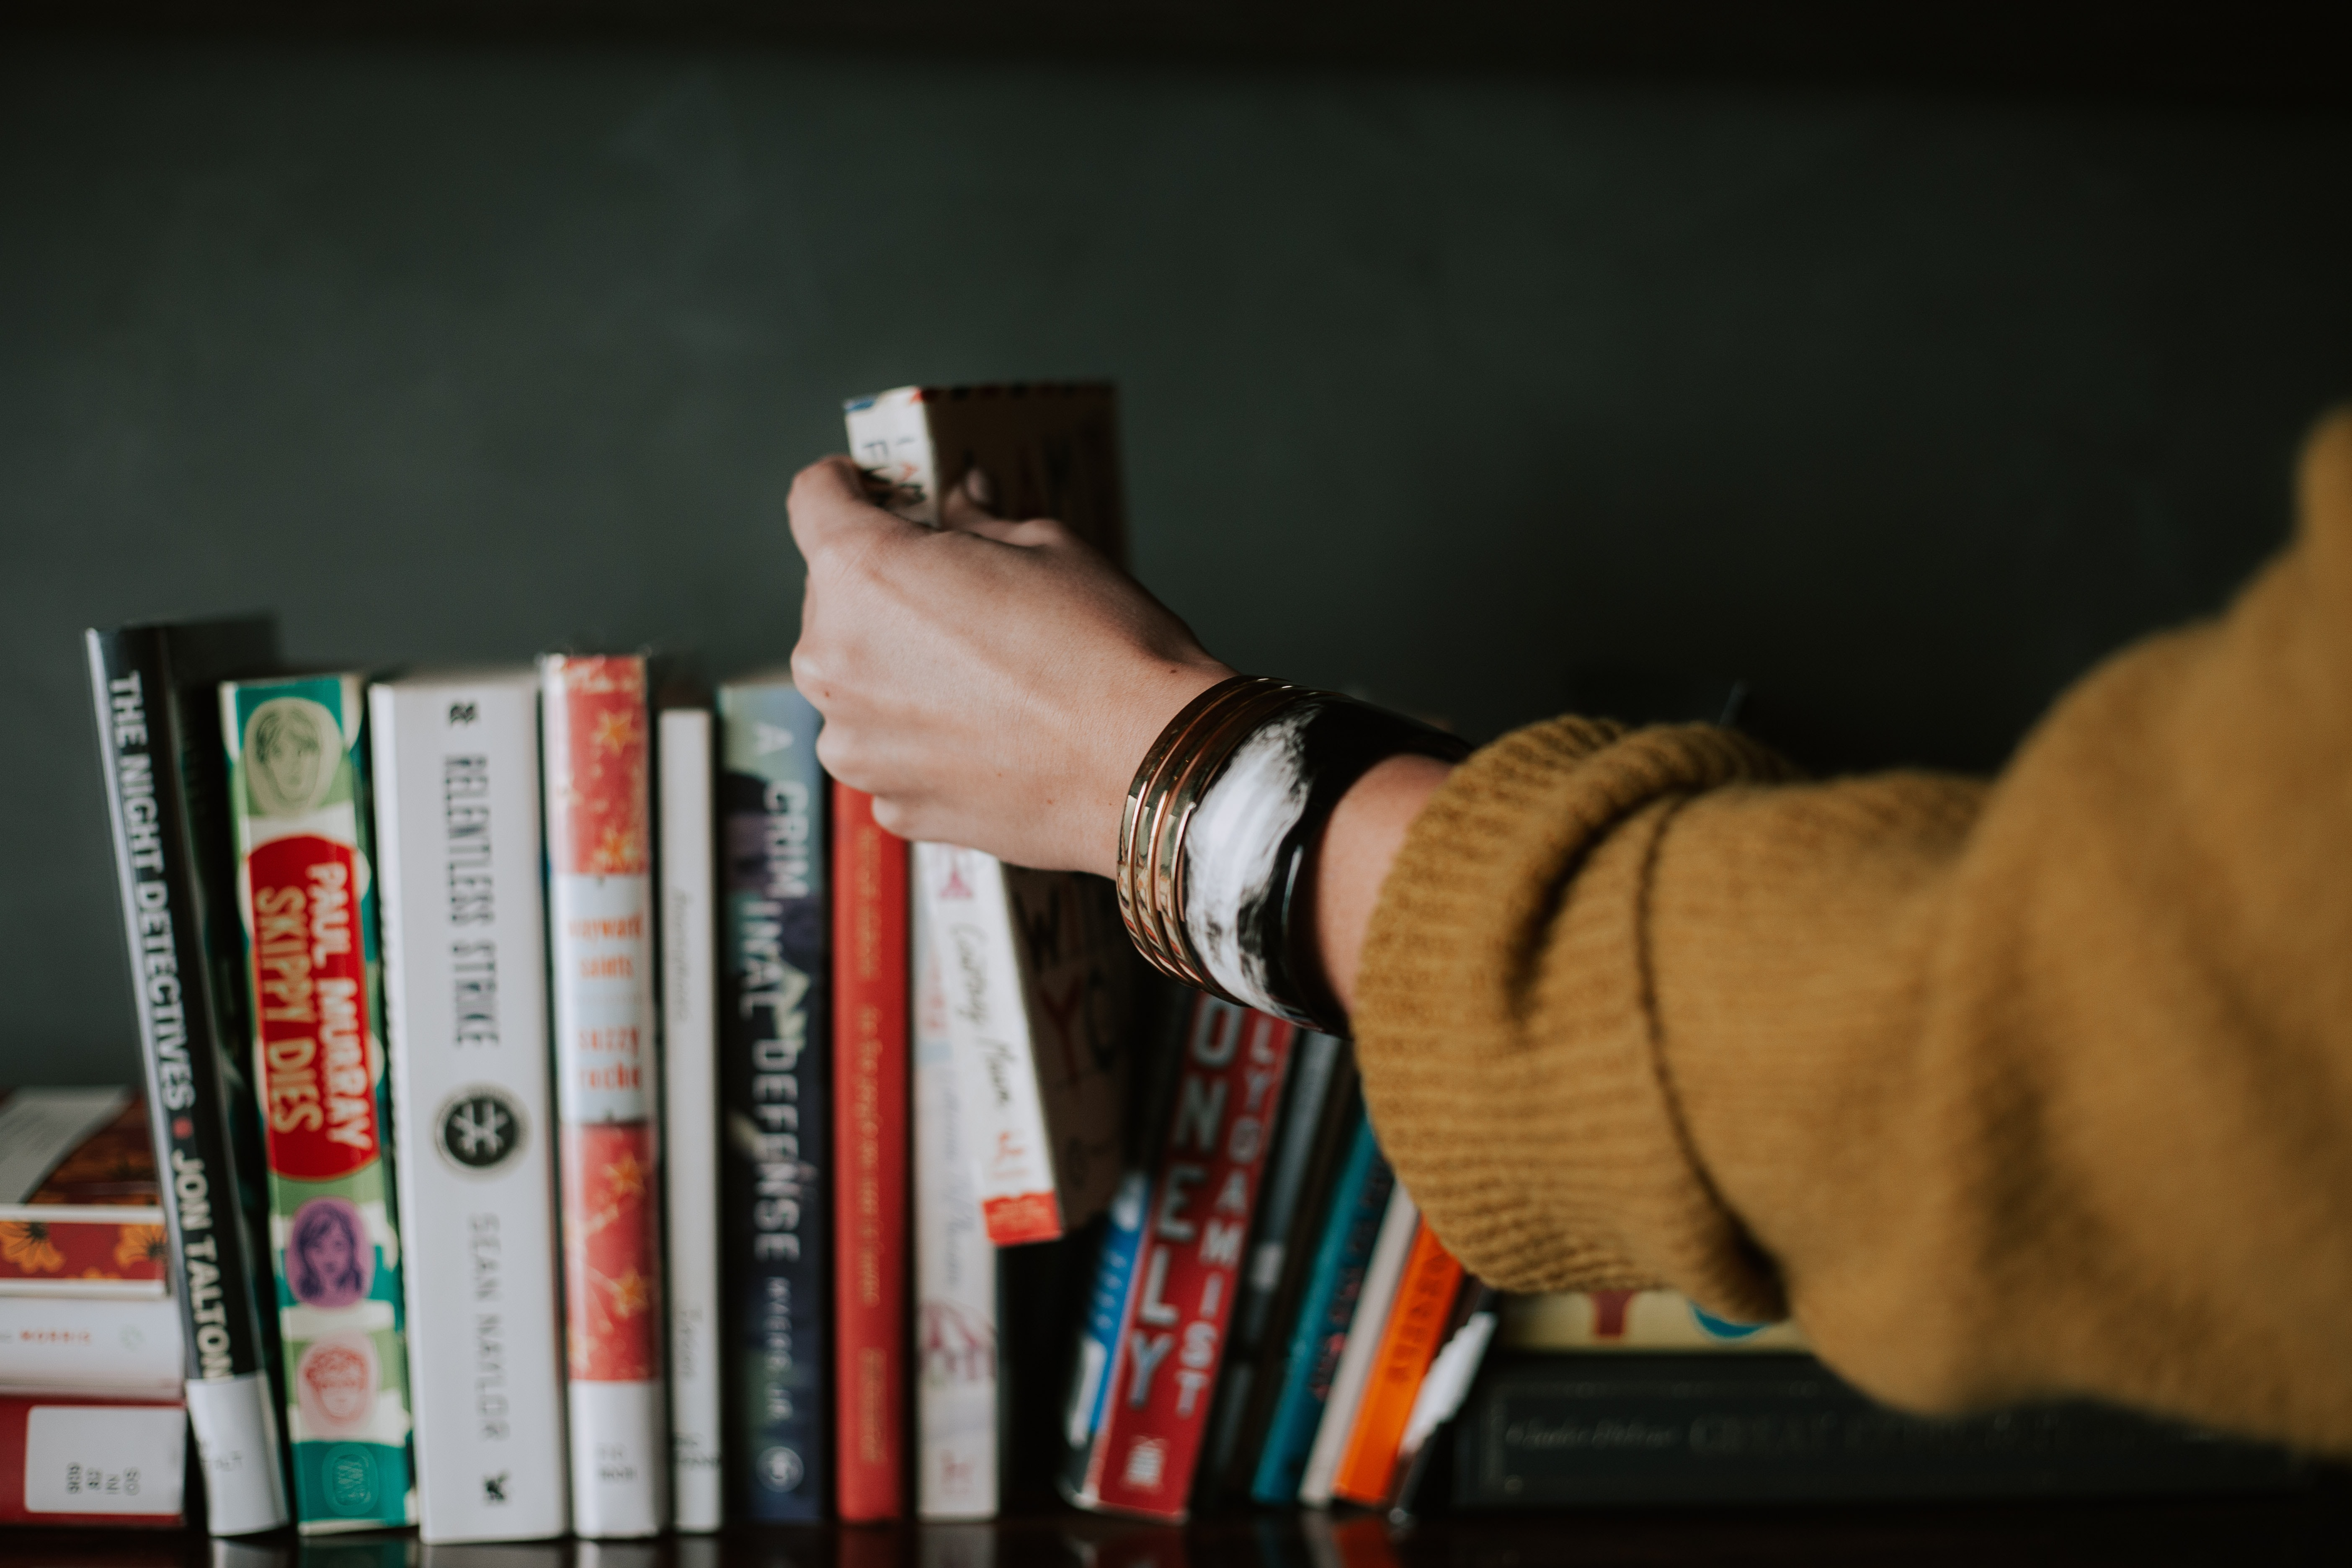 new year resolution read a book goals literature localbini biniblog bookshelf novel read